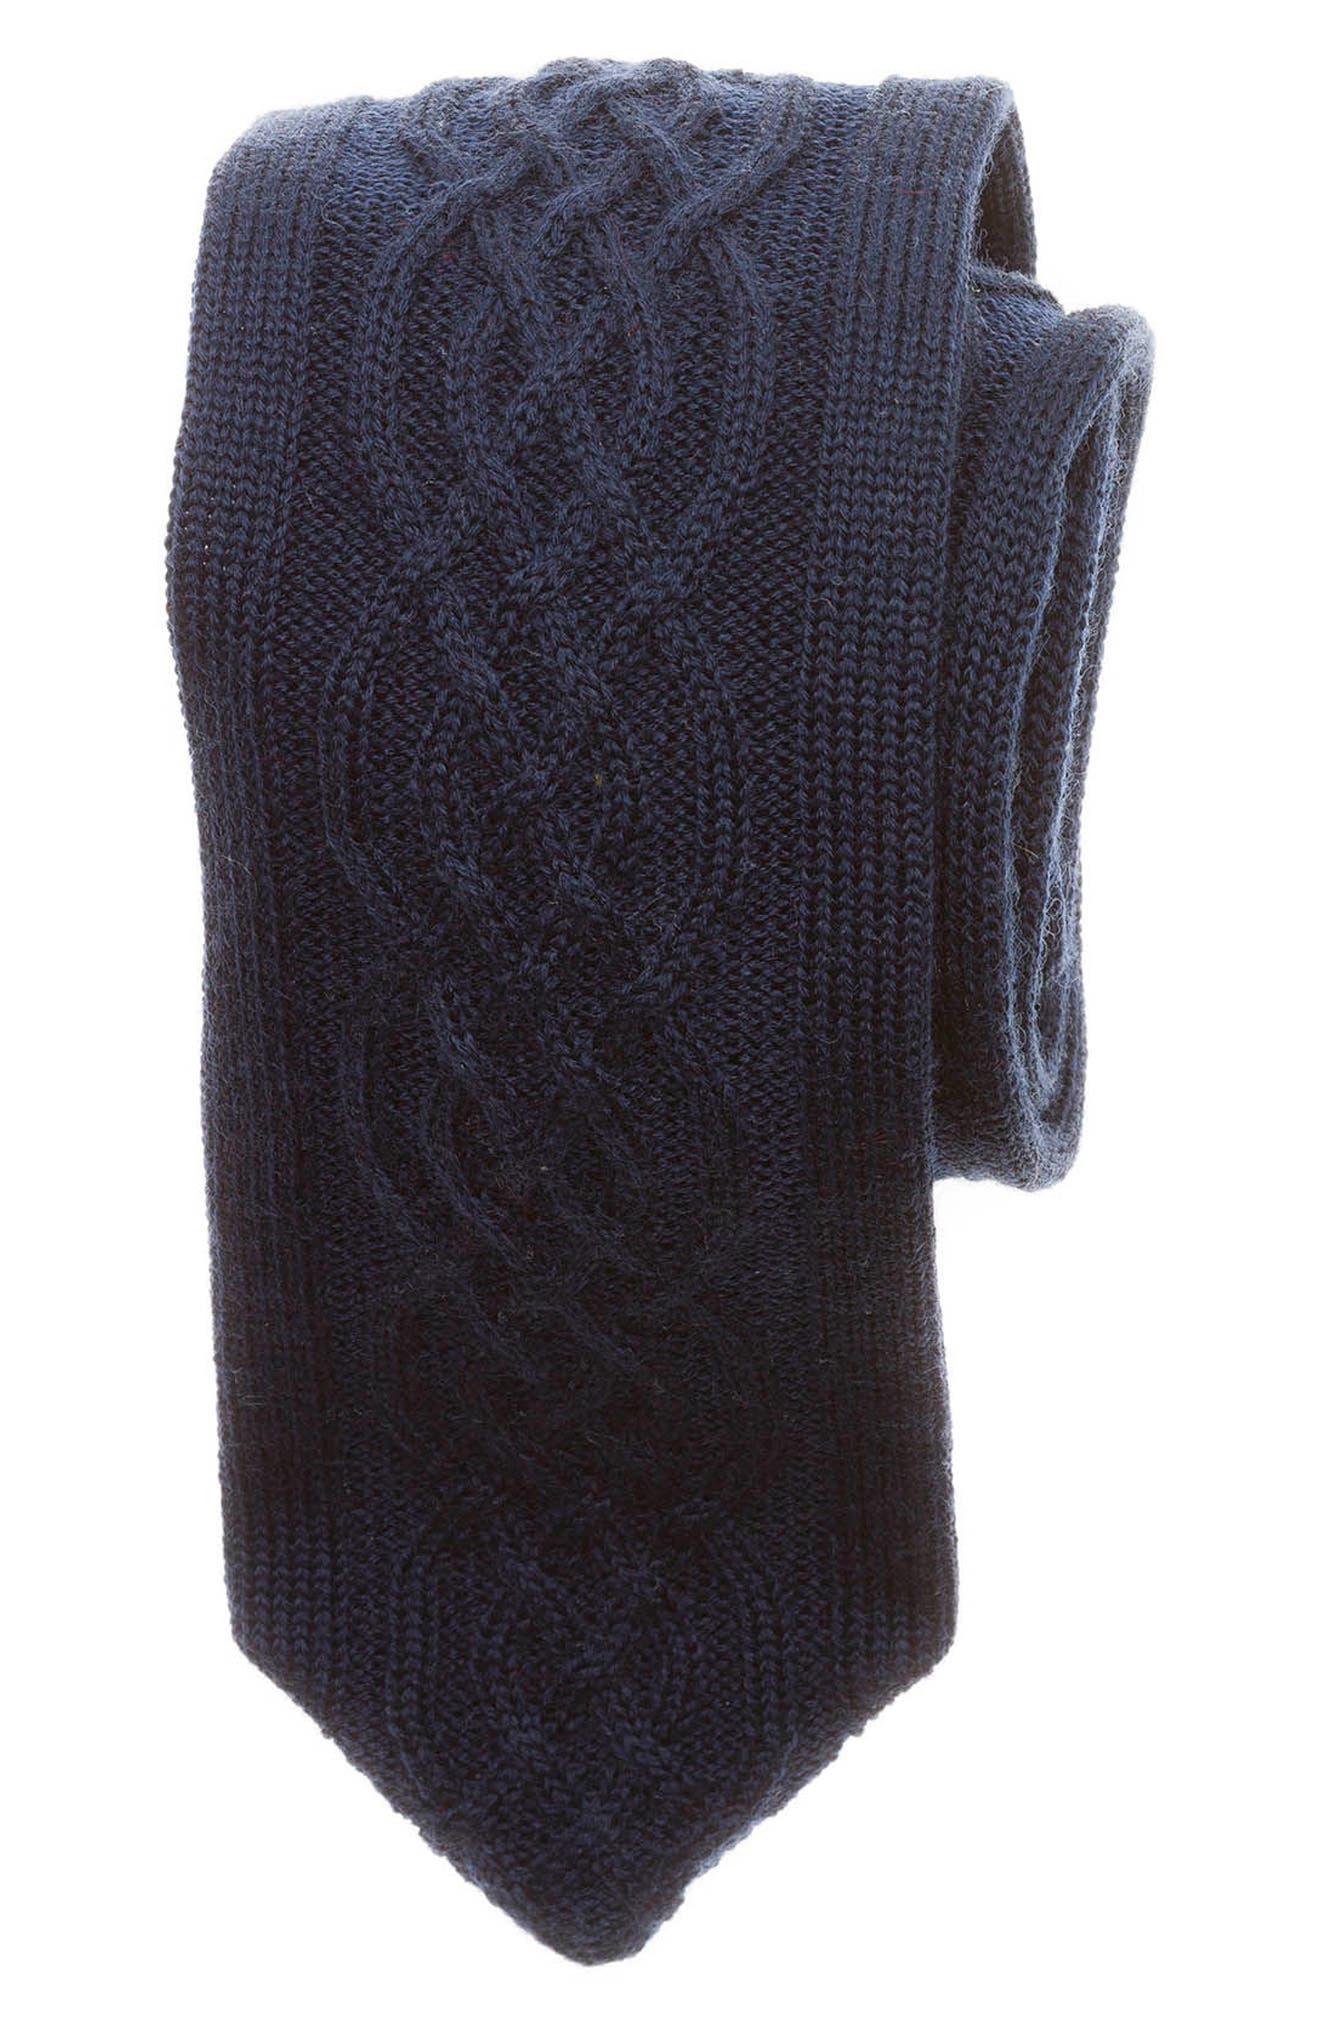 Main Image - hook + ALBERT Cable Knit Wool Tie